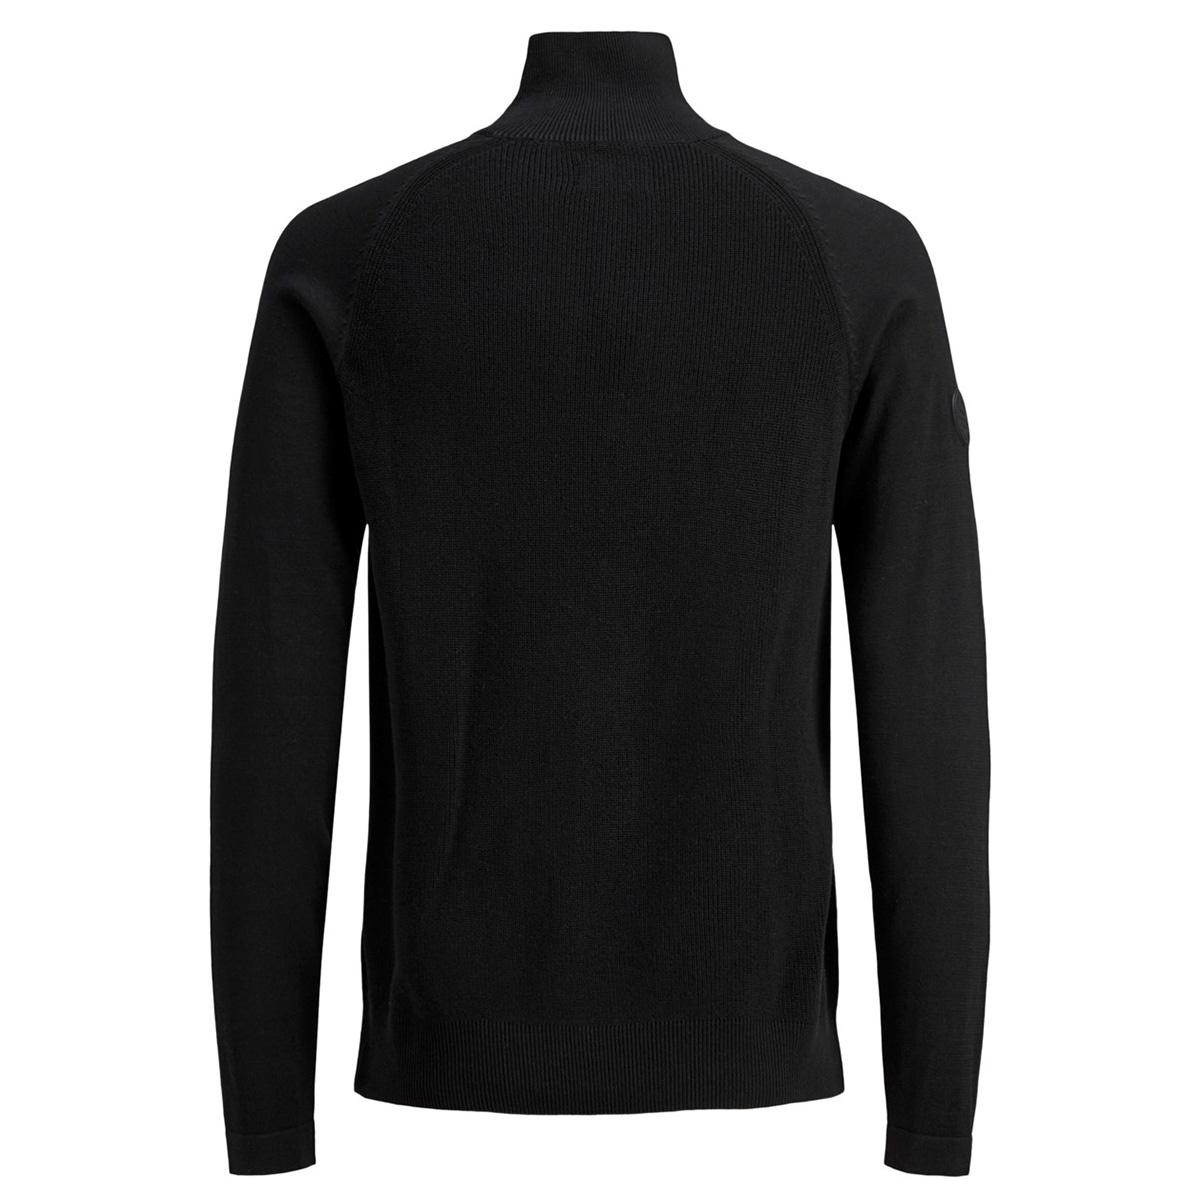 jorklover knit high neck 12158536 jack & jones trui tap shoe/knit fit